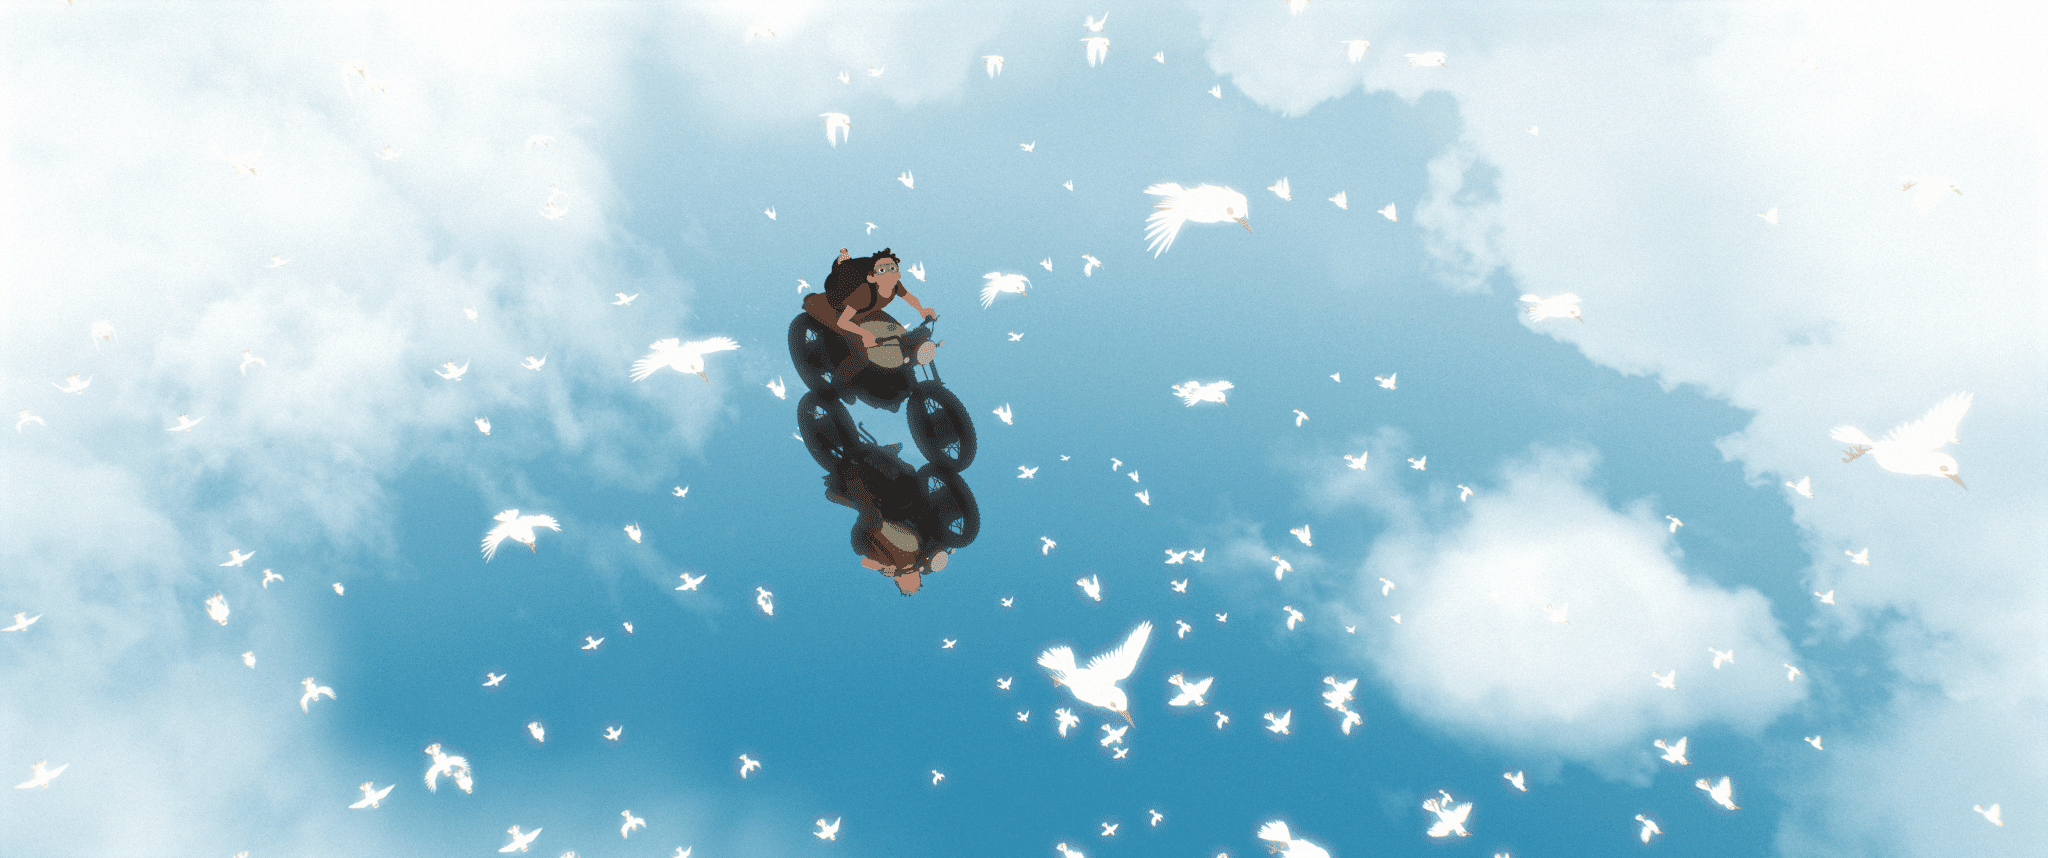 away animated film 2021